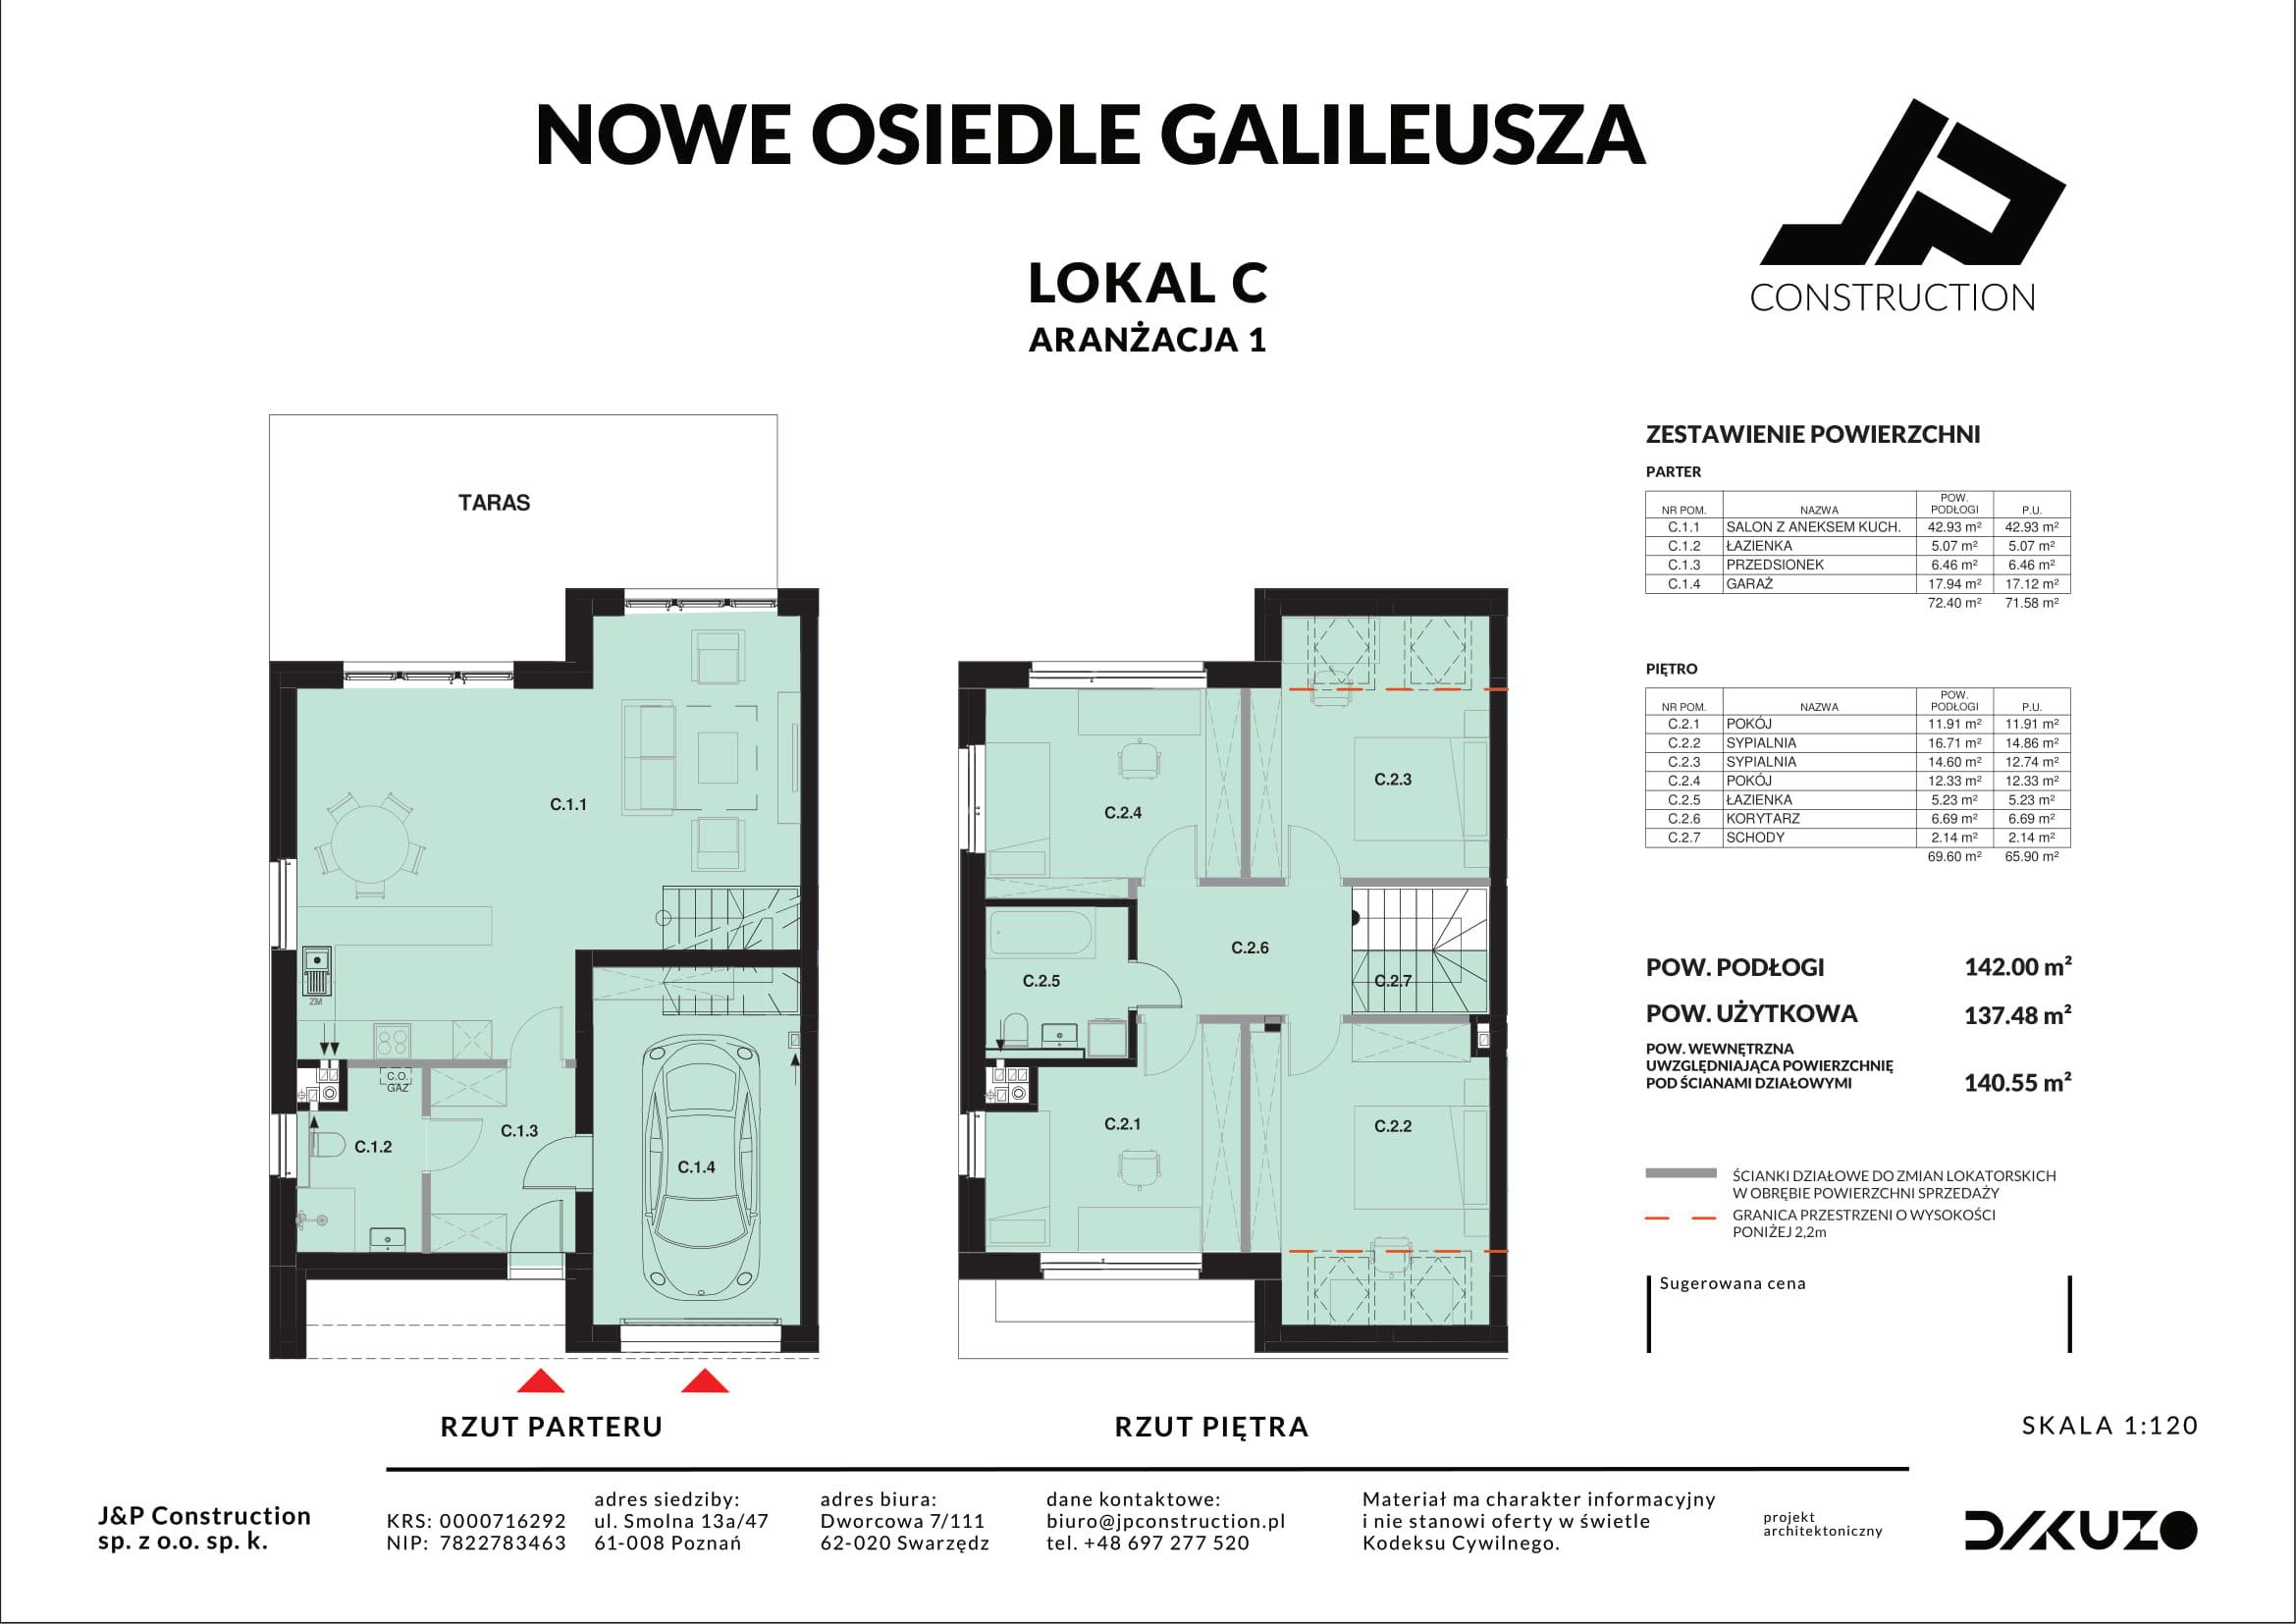 ZALASEWO-GAL-KARTA-LOKAL-C-aranzacja-1-1